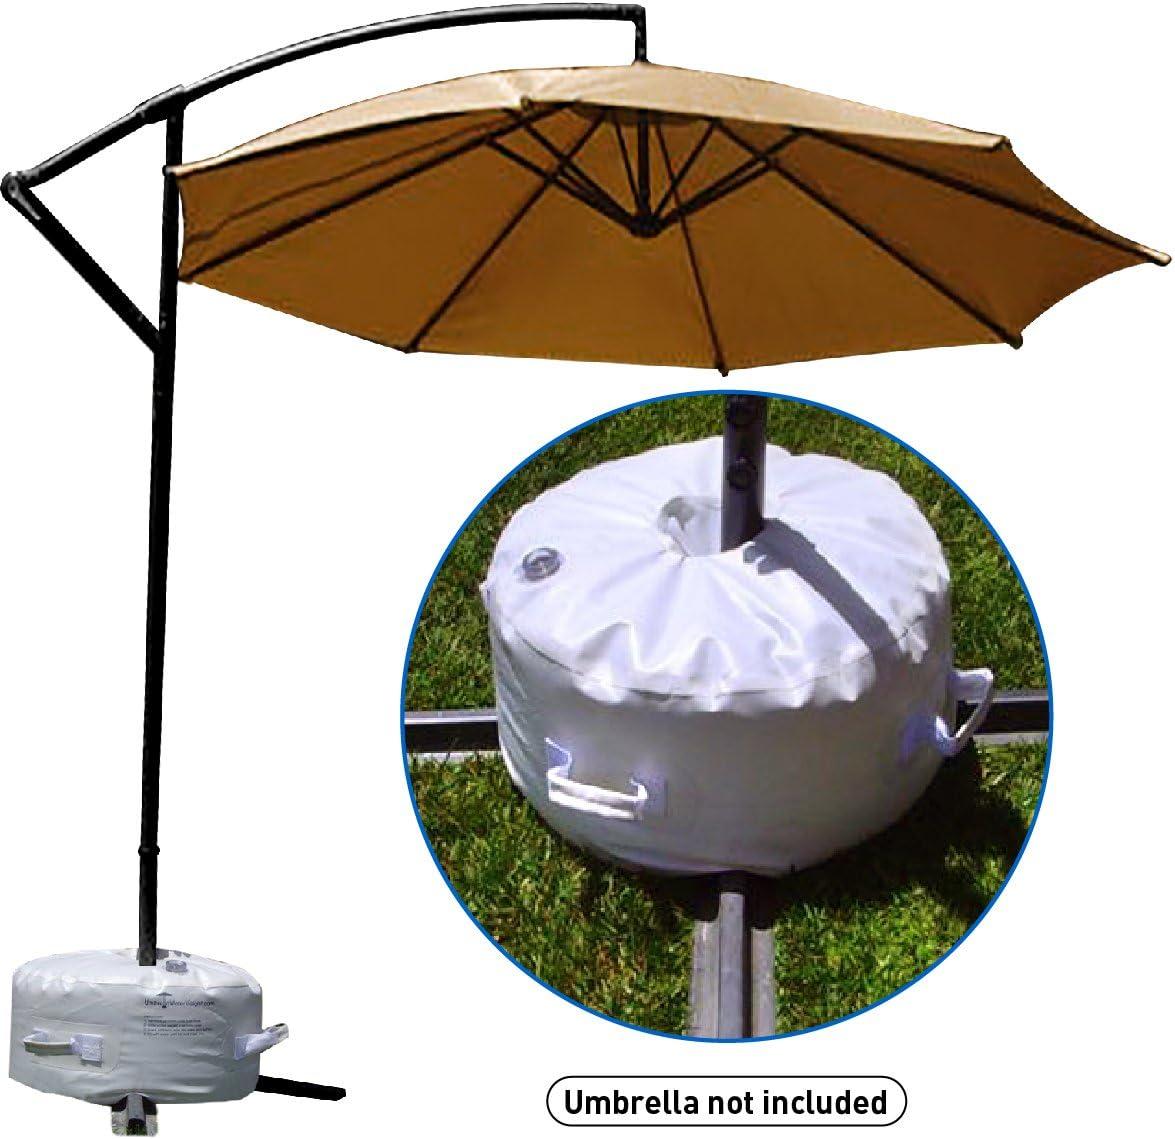 Easy Go Offset Umbrella Base Stand Weight – Works Also for Market Umbrella White